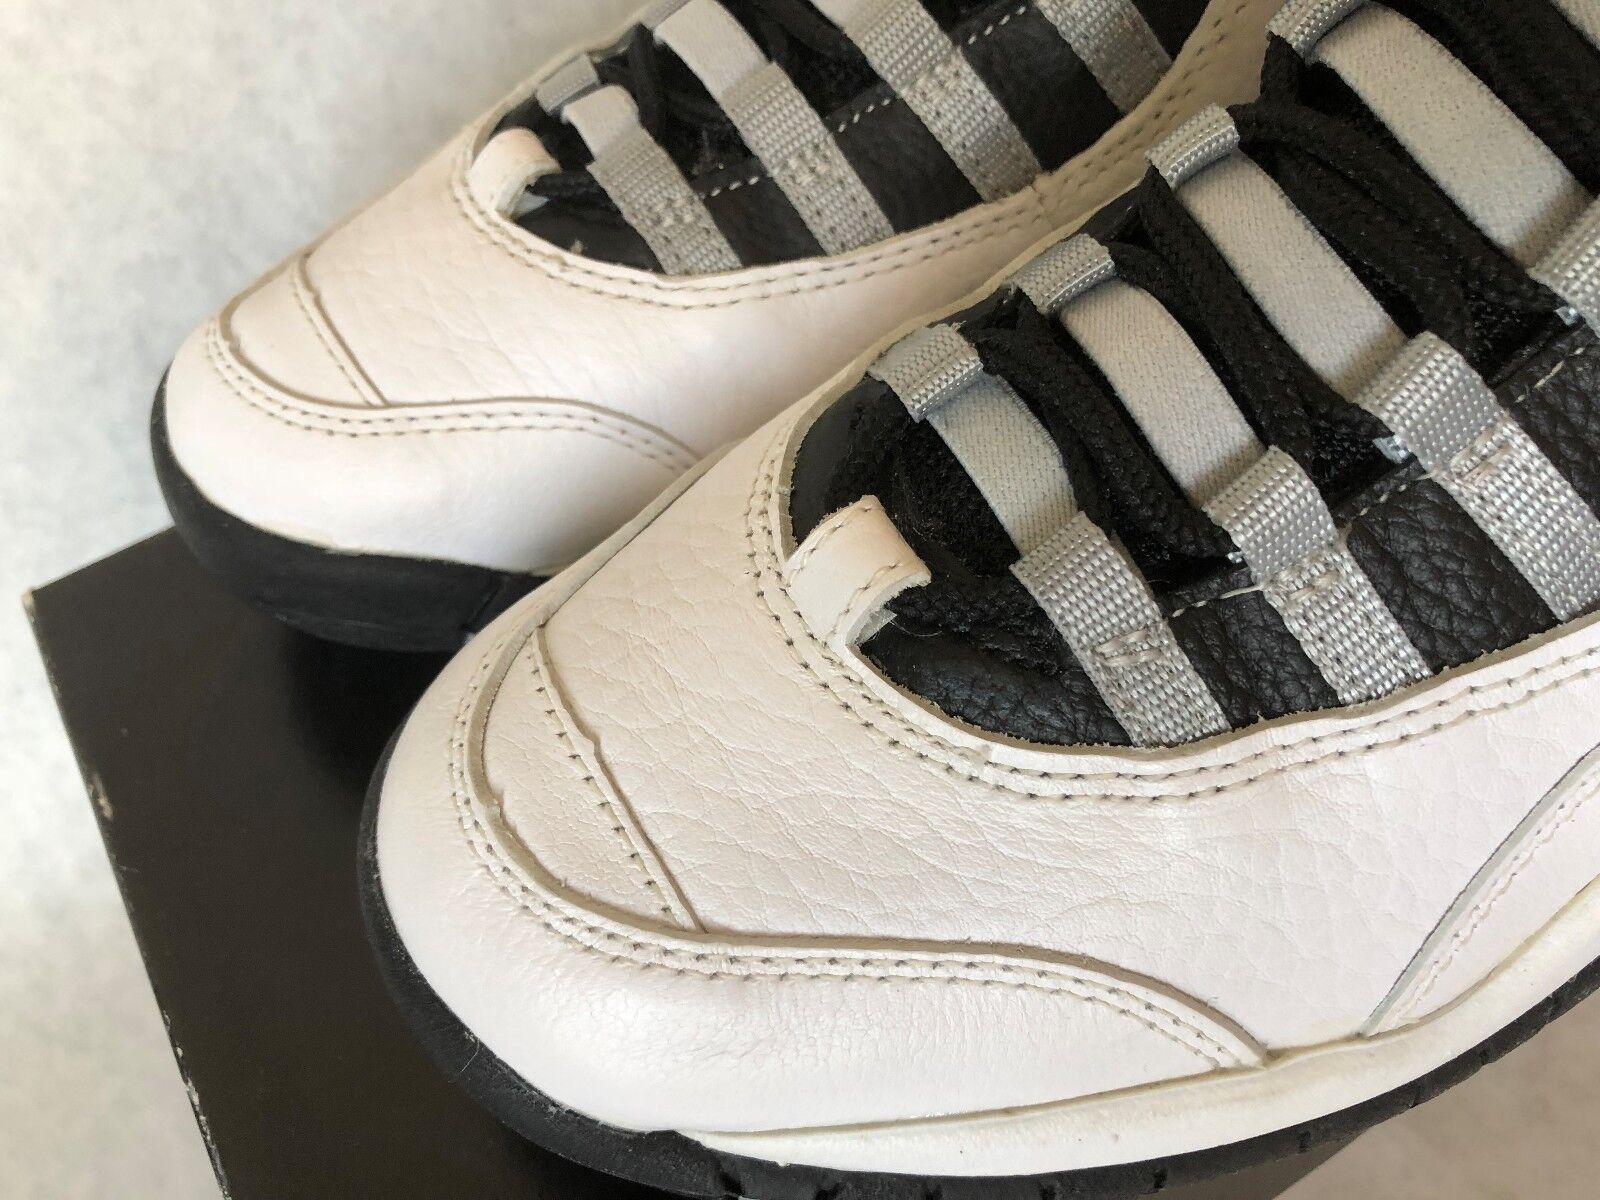 Rare Air Jordan gris acero og x tamaño cosecha 8 caja original nueva cosecha tamaño toe cap! 3592bf